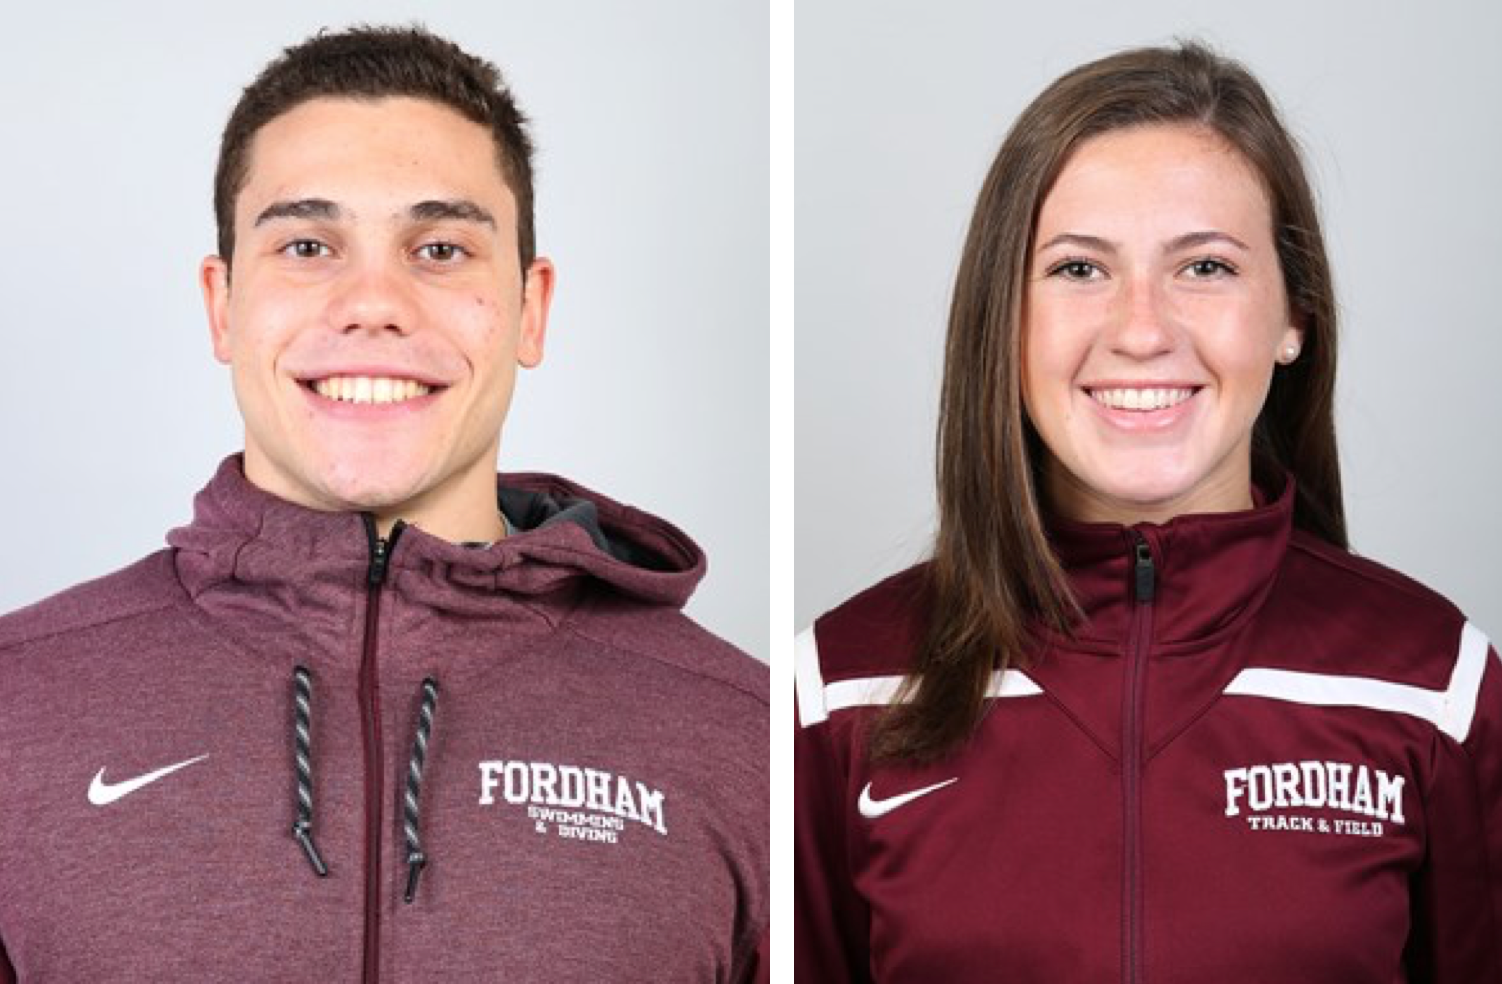 Fordham Athletes of the Week from January 24-30, 2018 (Courtesy of Fordham Athletics).